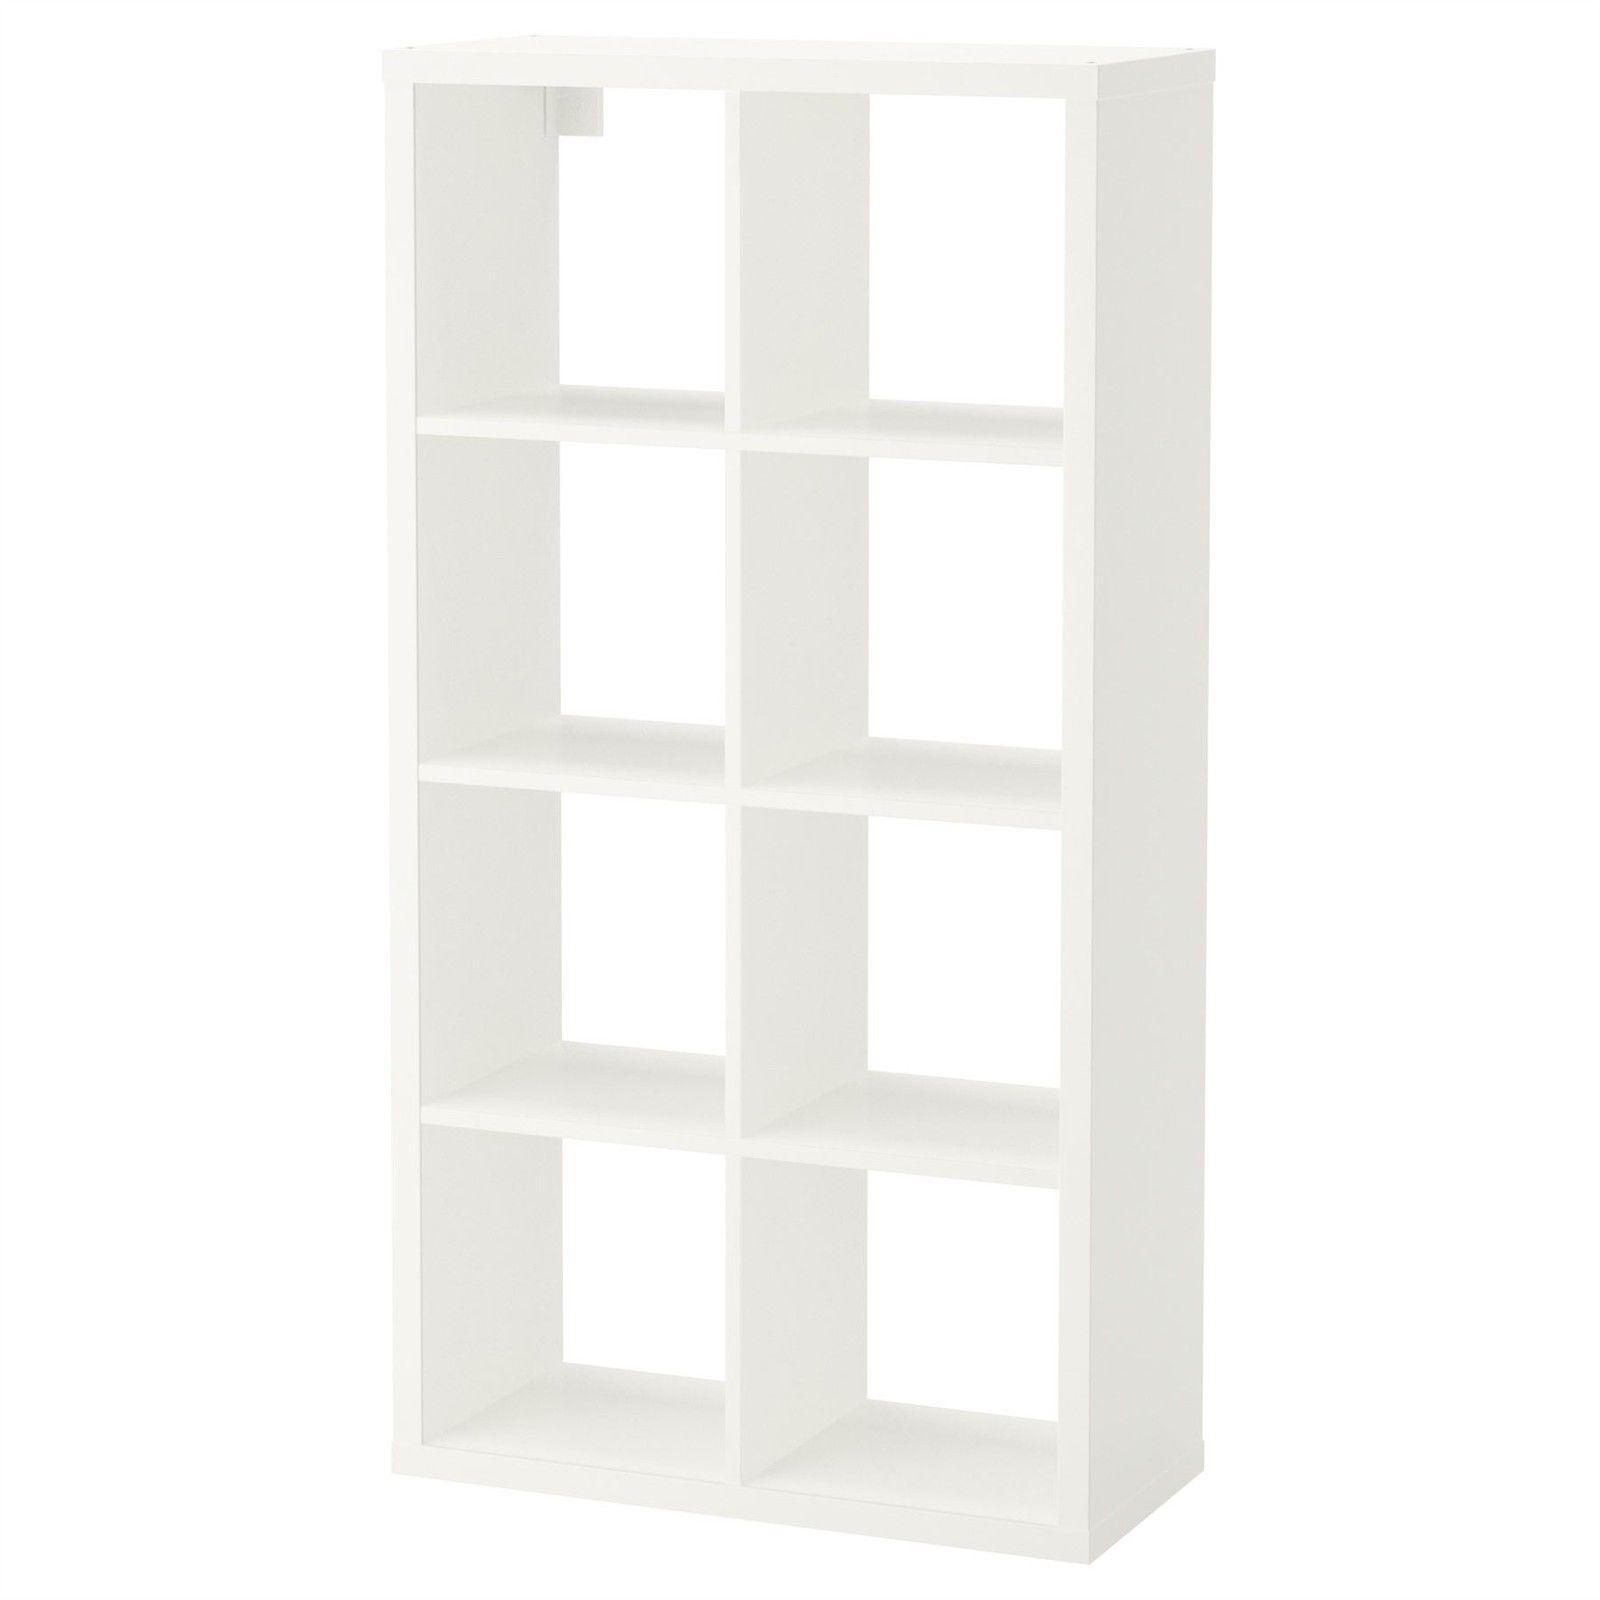 Ikea Flysta Shelving Unit White 8 Cube Storage Bookcase Rectangle by